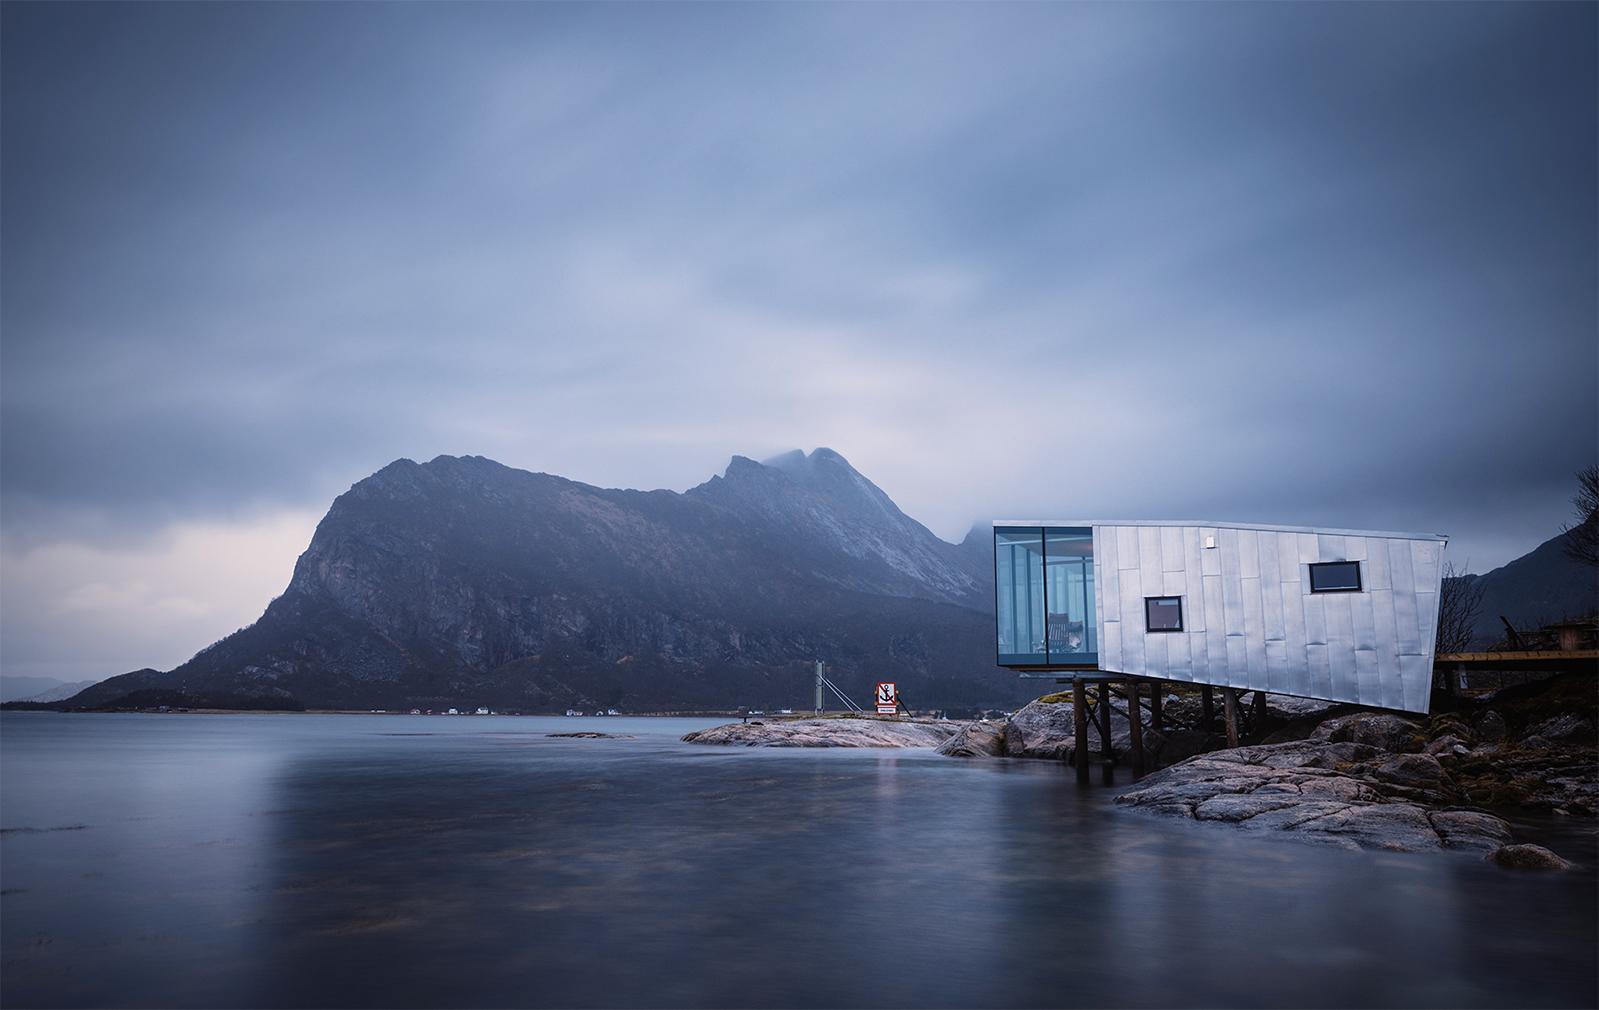 Manshausen 2.0 eco-resort in Norway